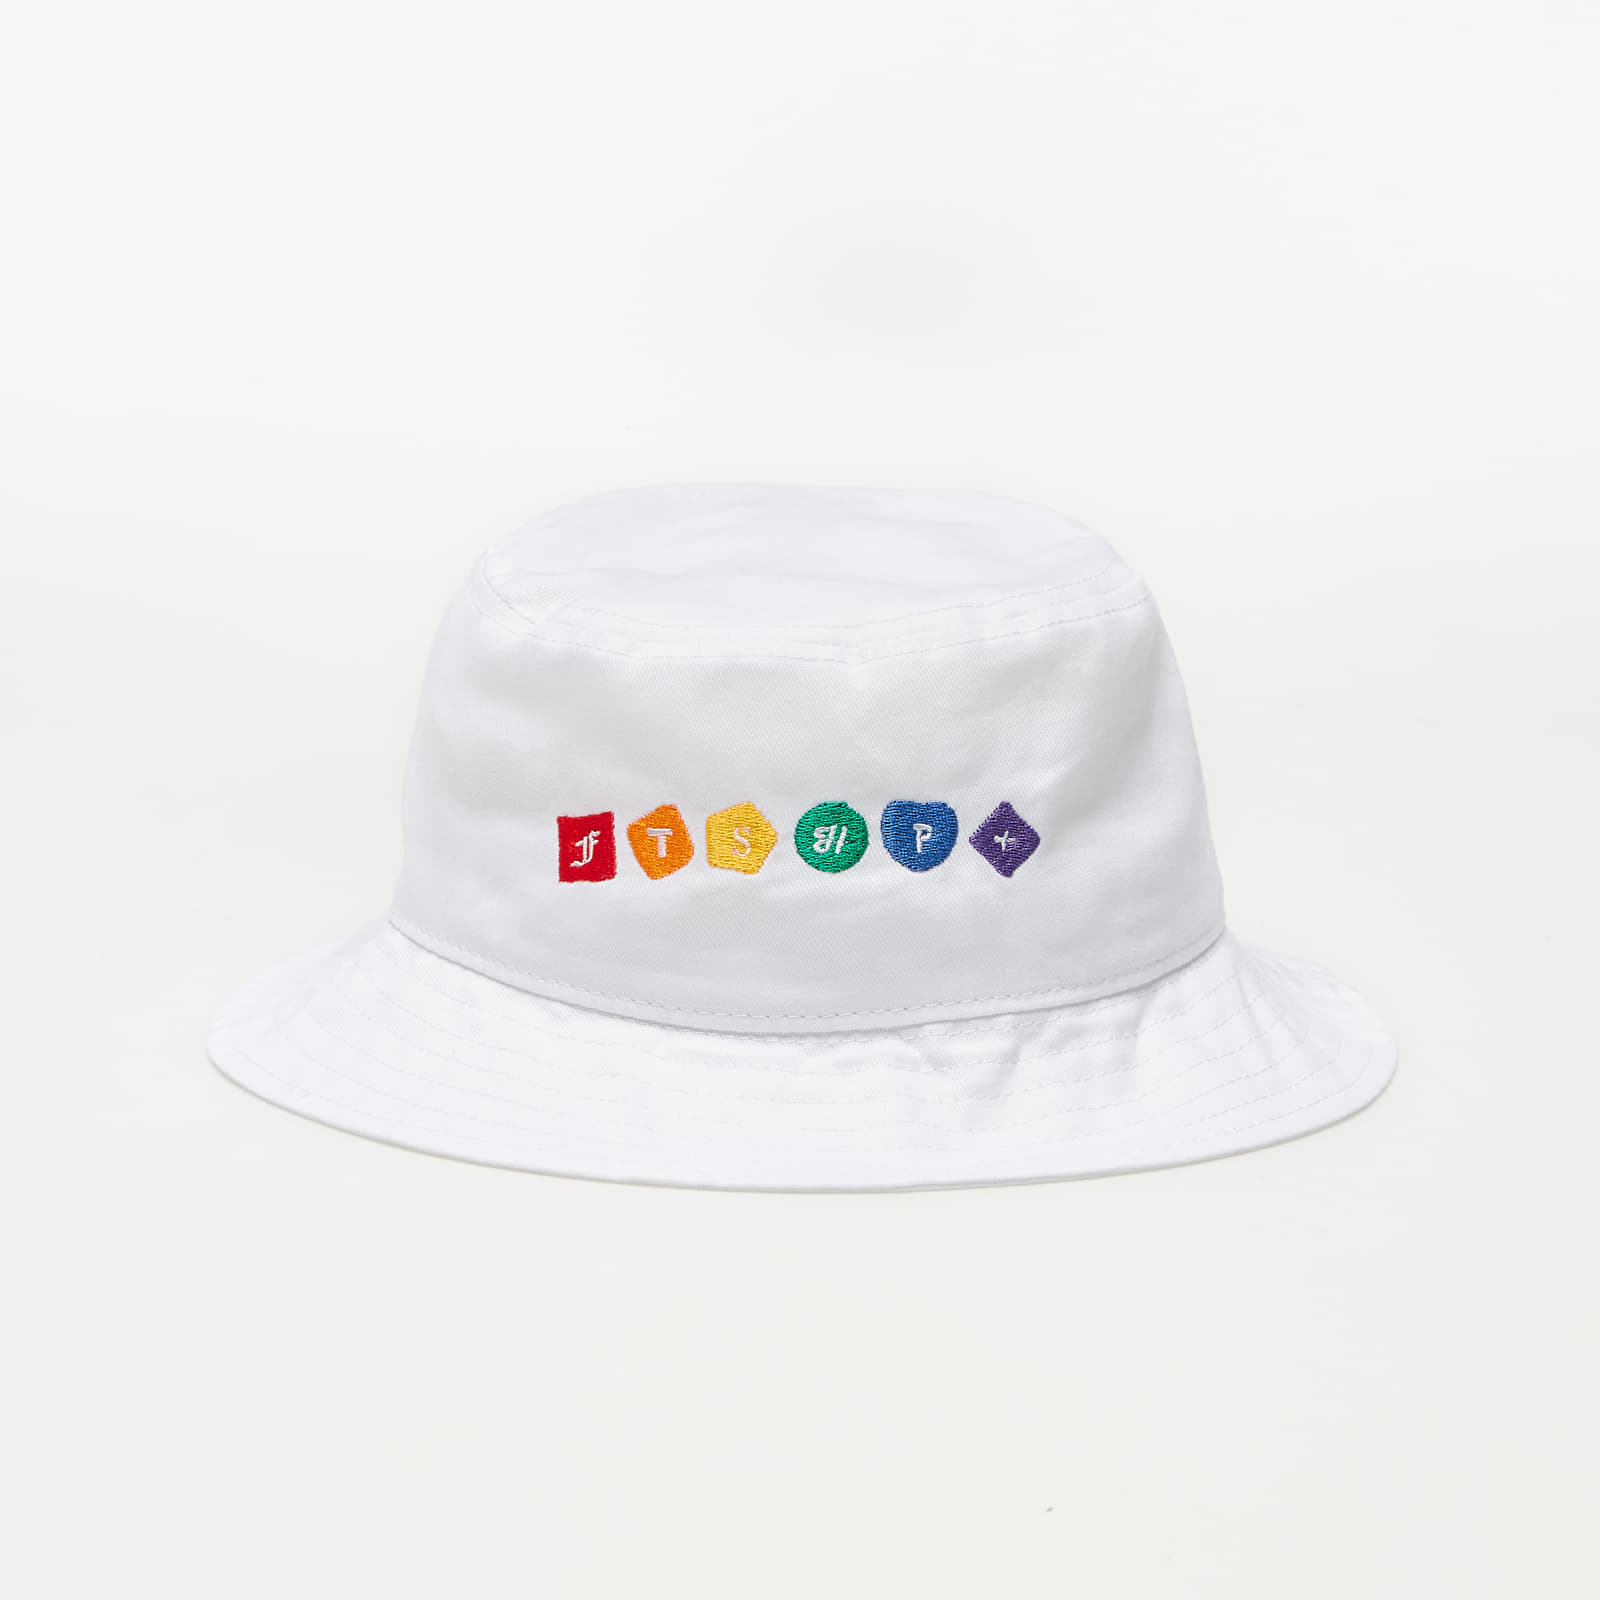 Klobouky Footshop PRIDE Bucket Hat White